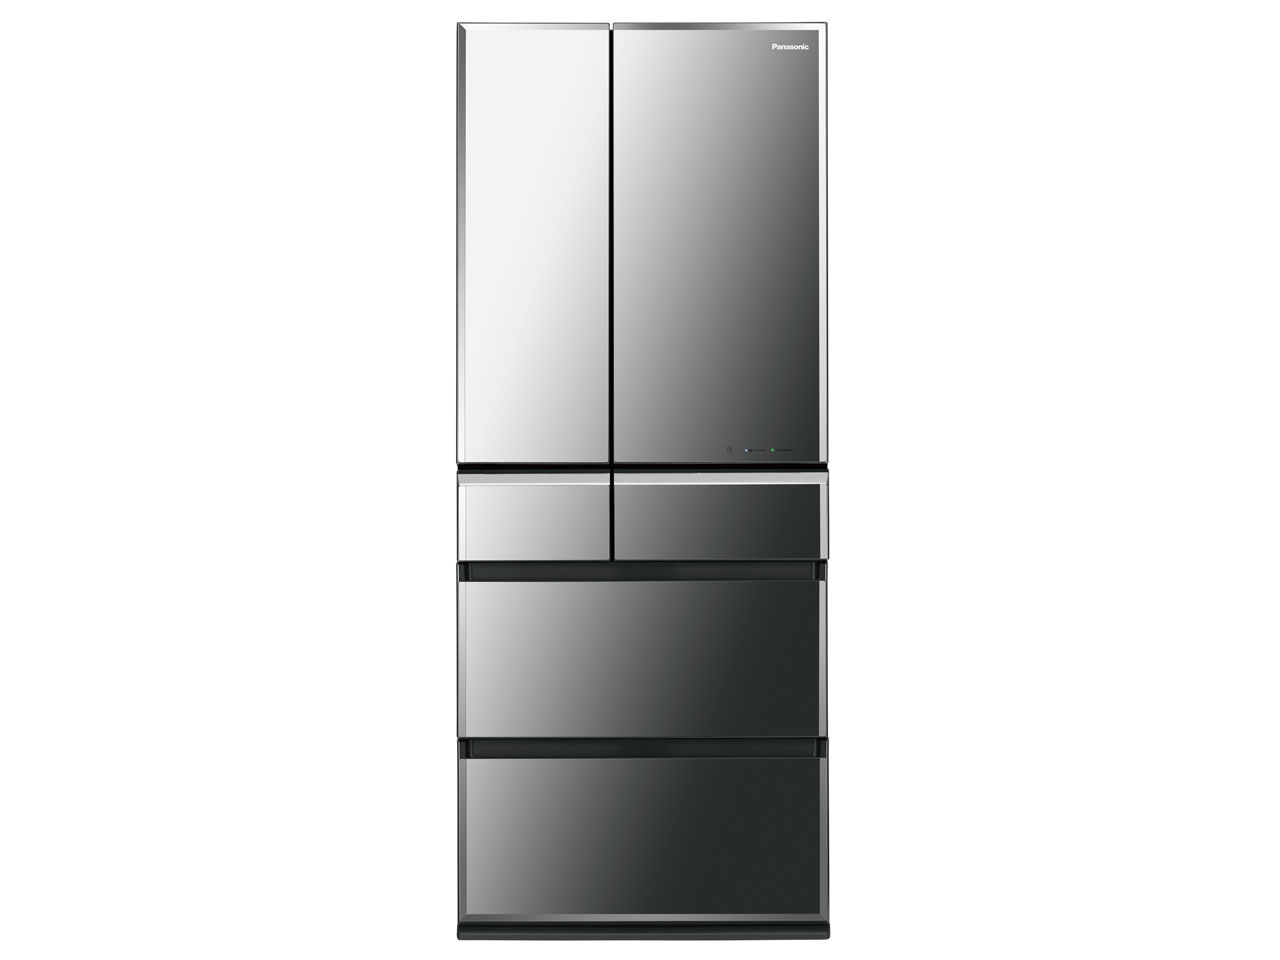 NR-F602WPV-X パナソニック 601L冷蔵庫